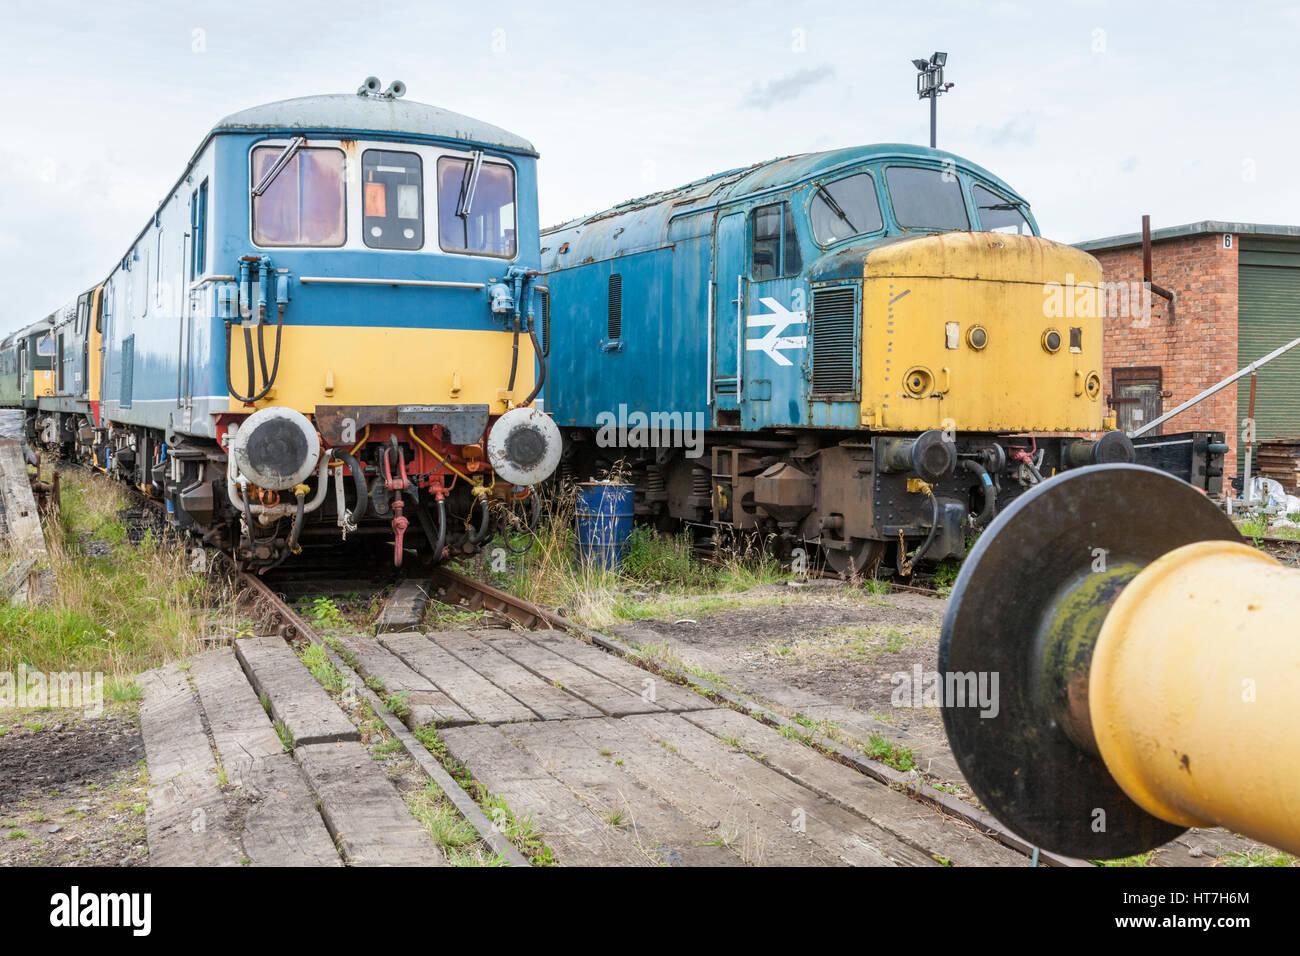 Many old diesel locomotives awaiting restoration at Nottingham Transport Heritage Centre, Ruddington, Nottinghamshire, - Stock Image